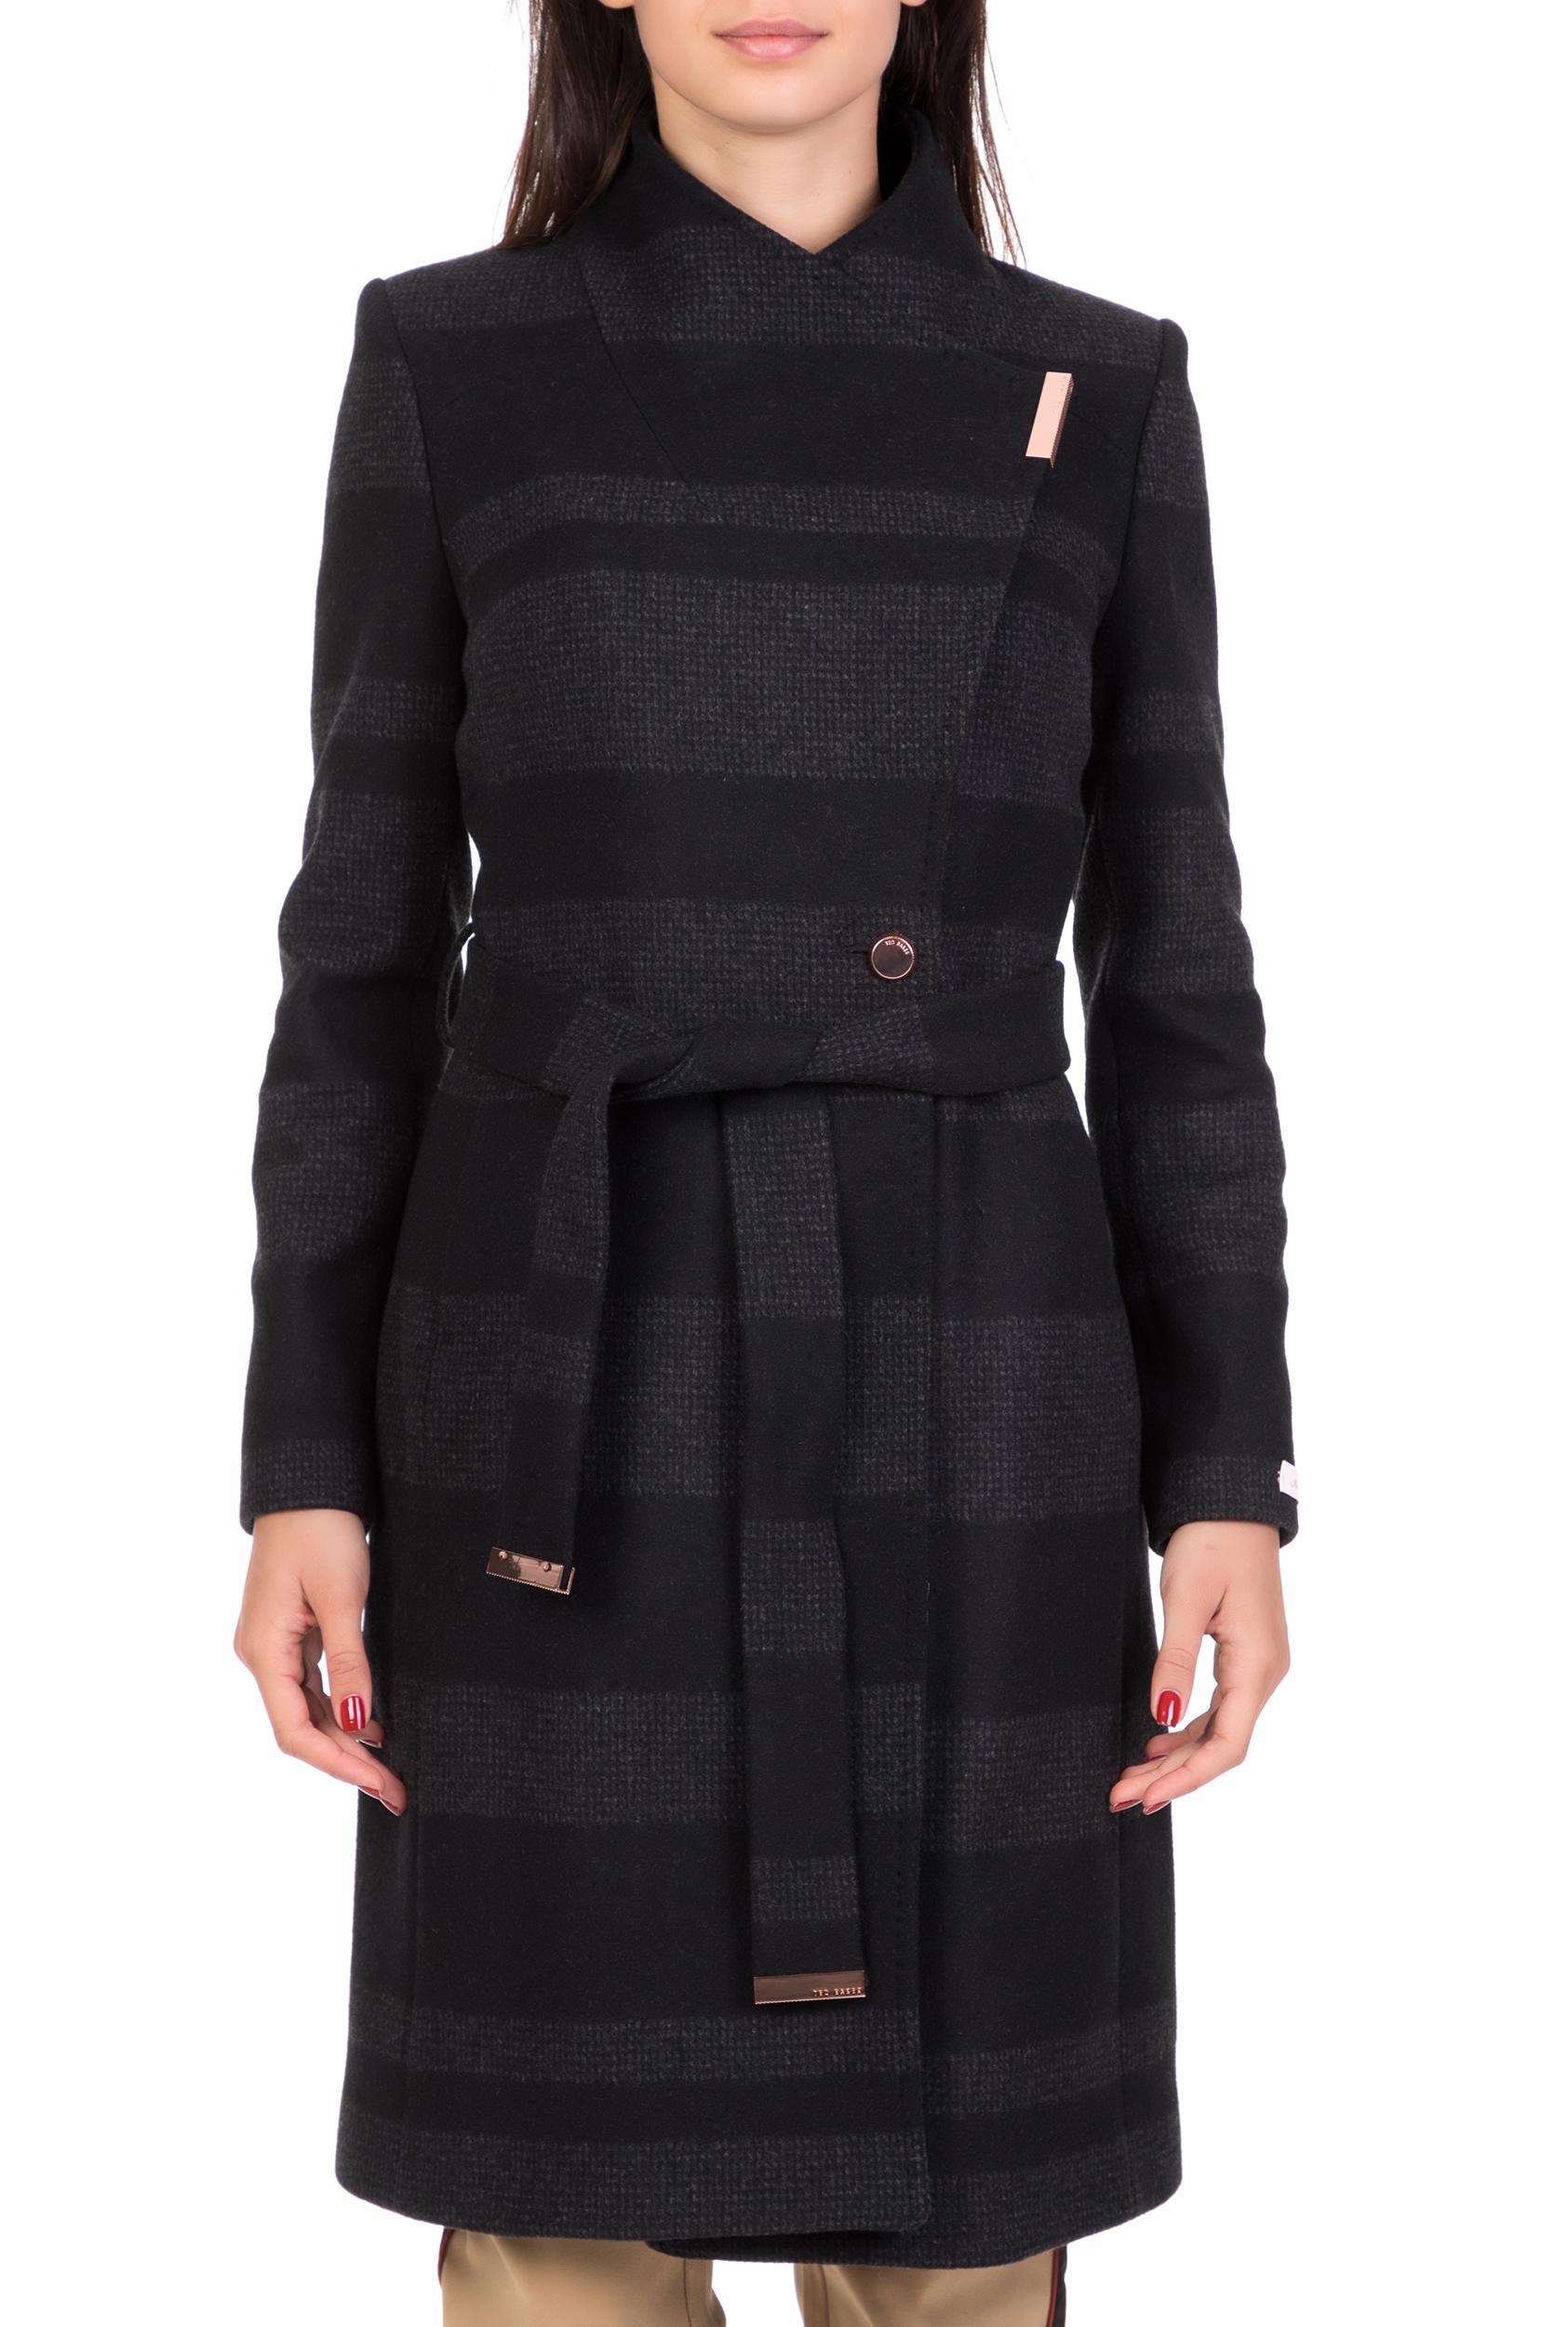 TED BAKER - Γυναικείο μακρύ ριγέ παλτό TED BAKER NARRLA μαύρο-γκρι b5d3e17c5ec